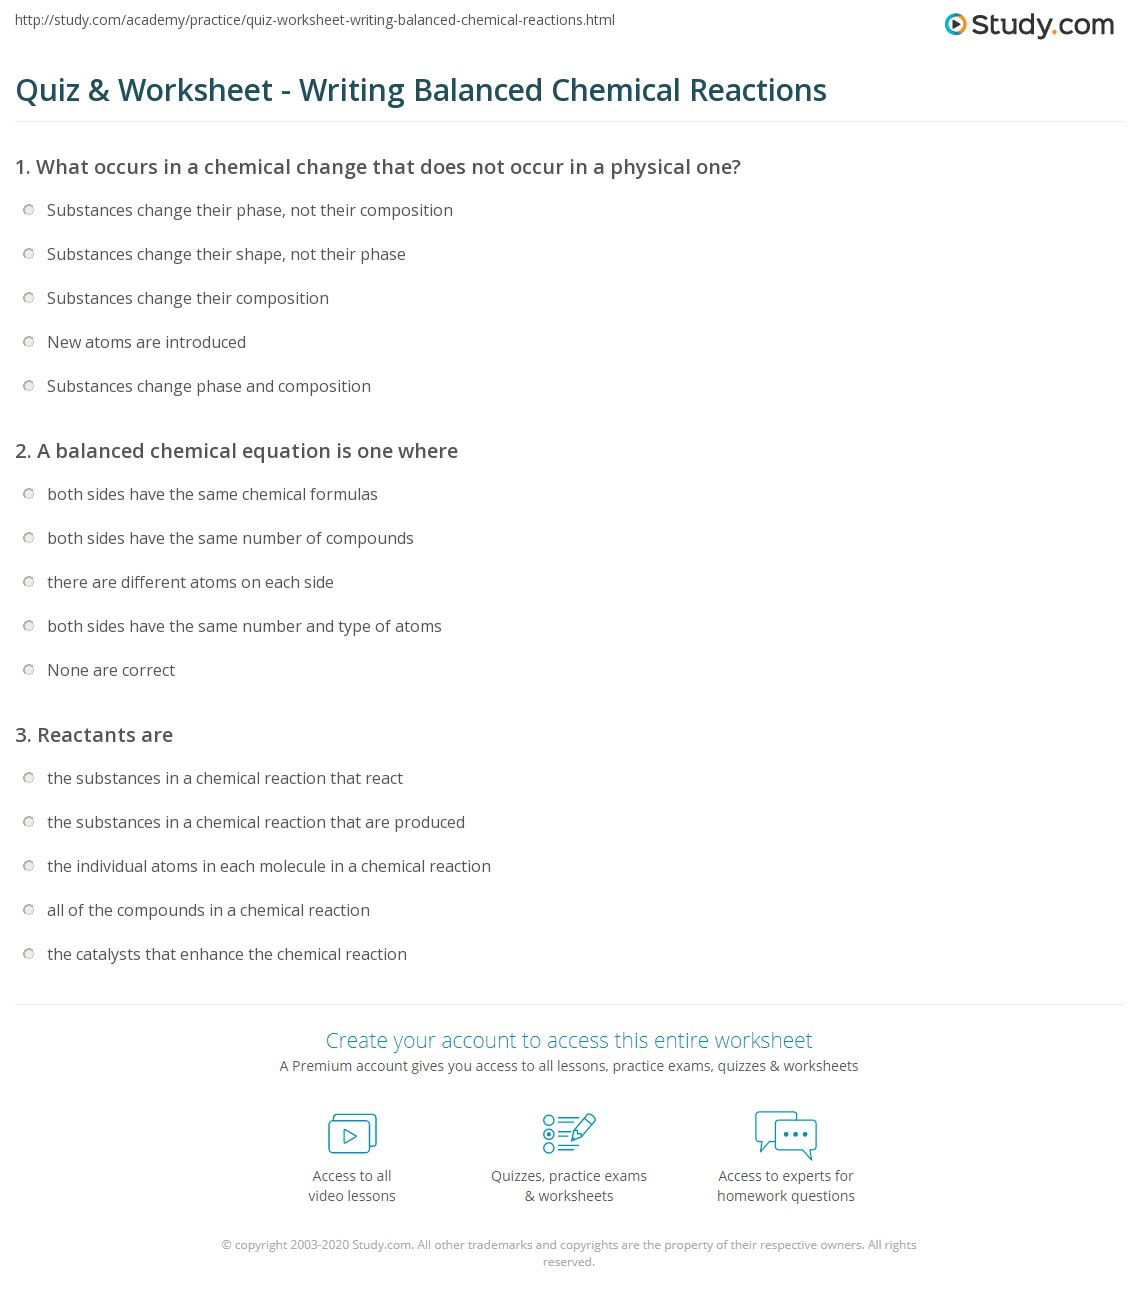 Balancing Chemical Equations Chapter 7 Worksheet 1 – Balancing Chemical Equations Chapter 7 Worksheet 1 Answers